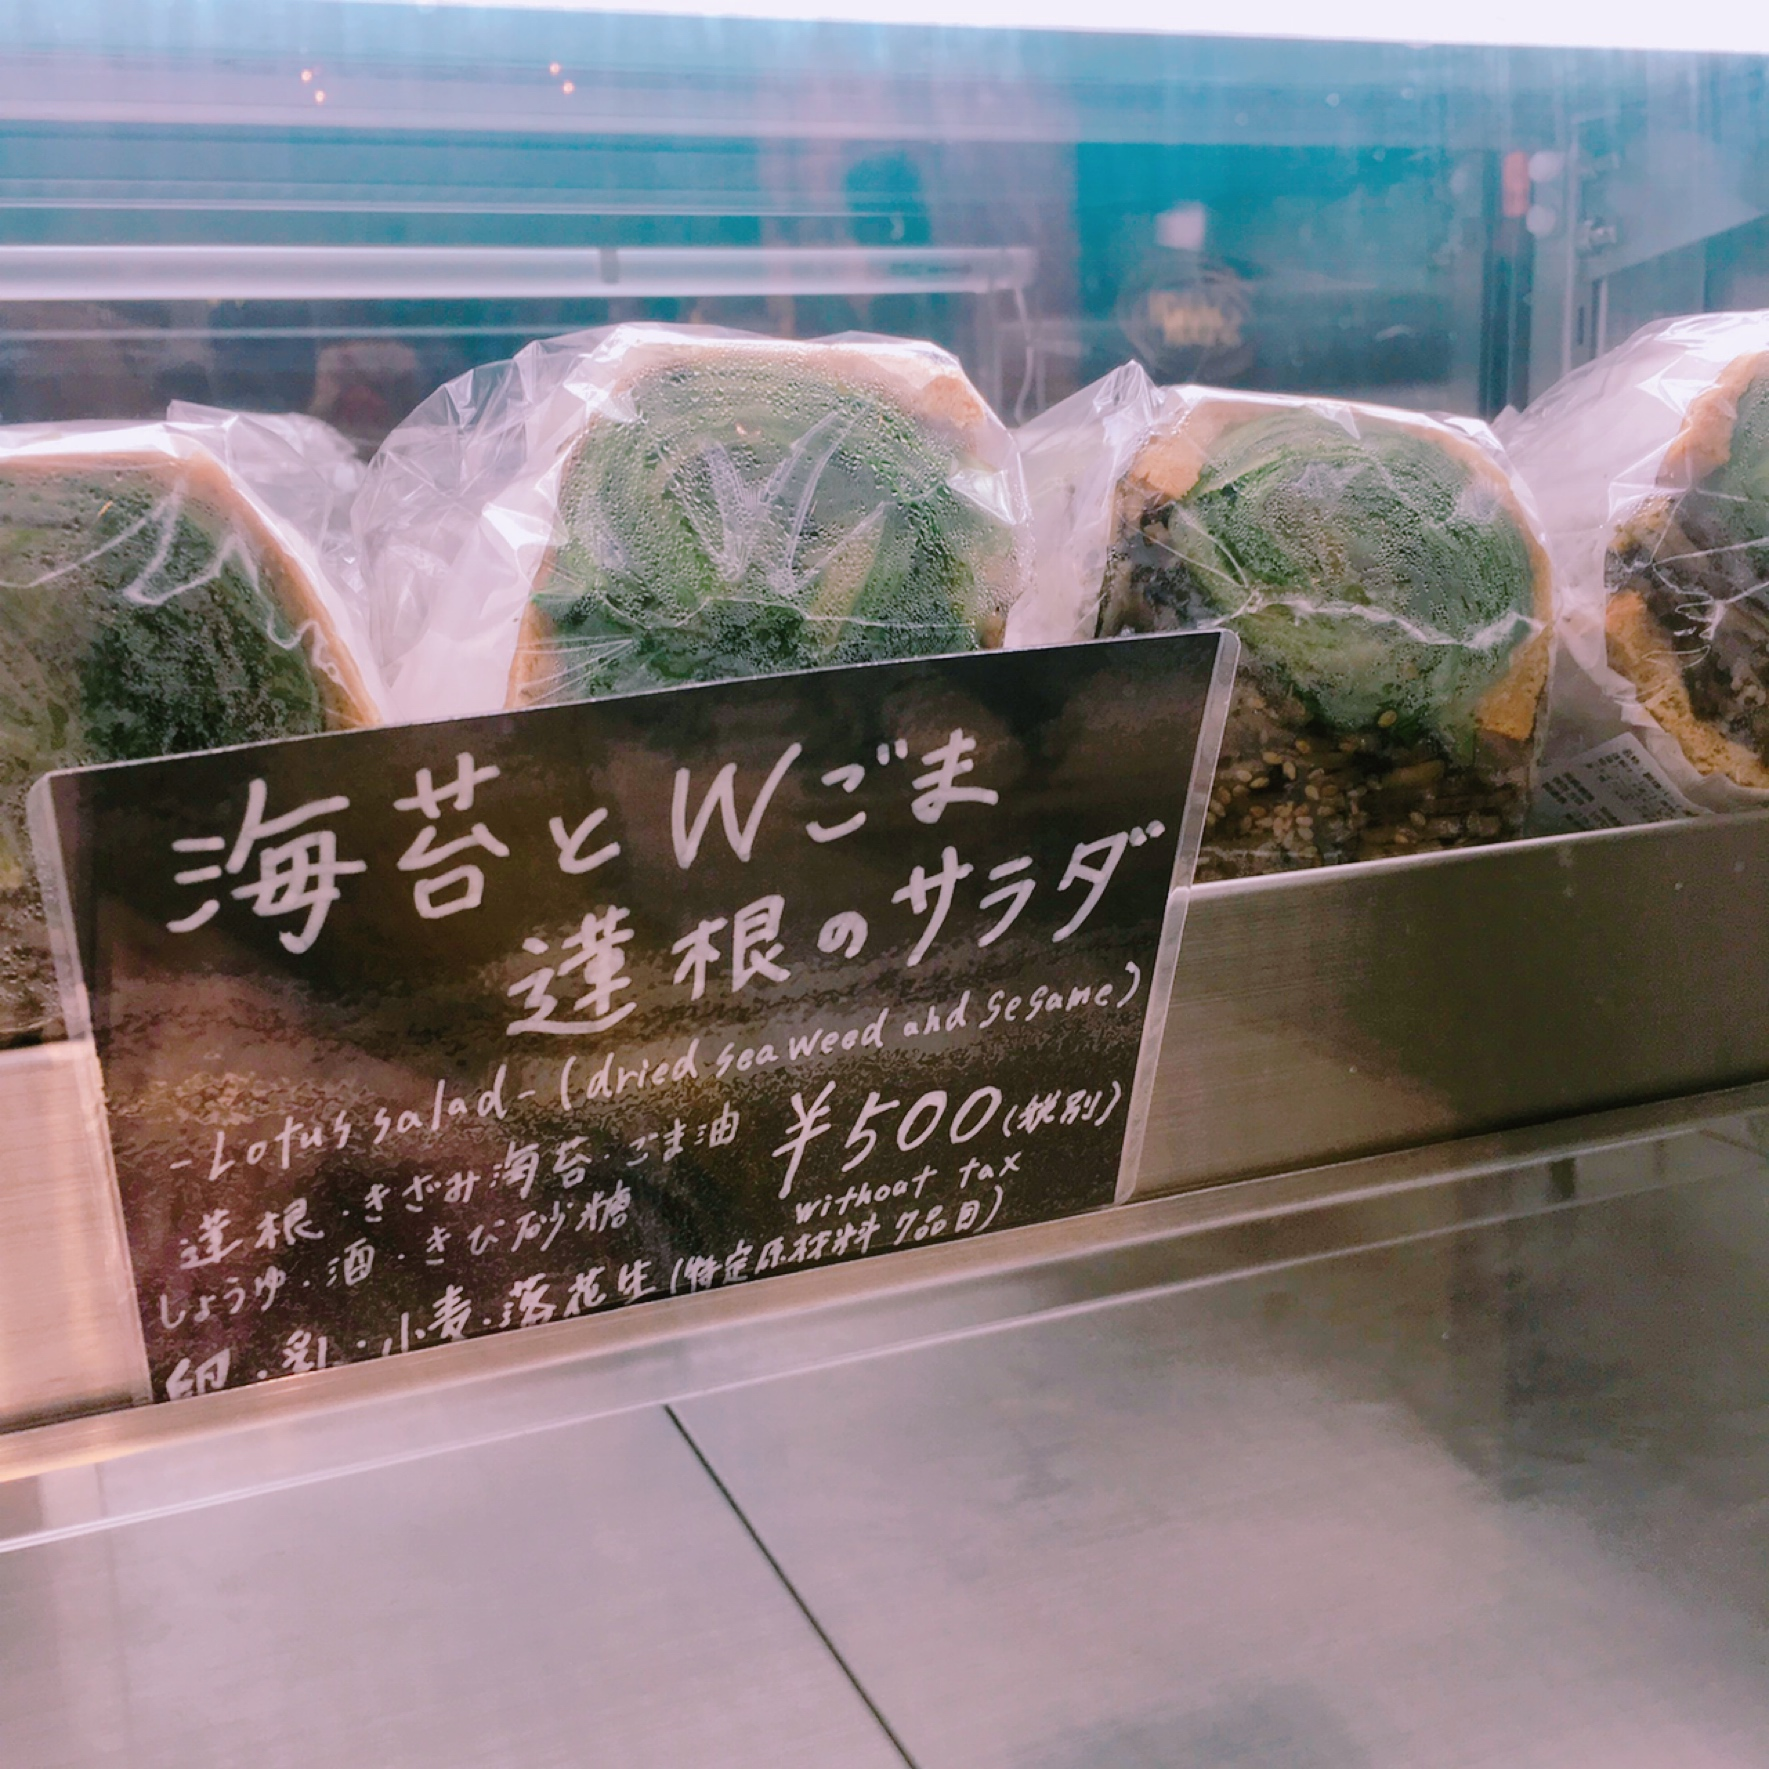 #22【#cafestagram】❤️:《東京•日本橋》都内で人気沸騰中の絶品萌え断サンドイッチをPOTASTAで☝︎❤︎_3